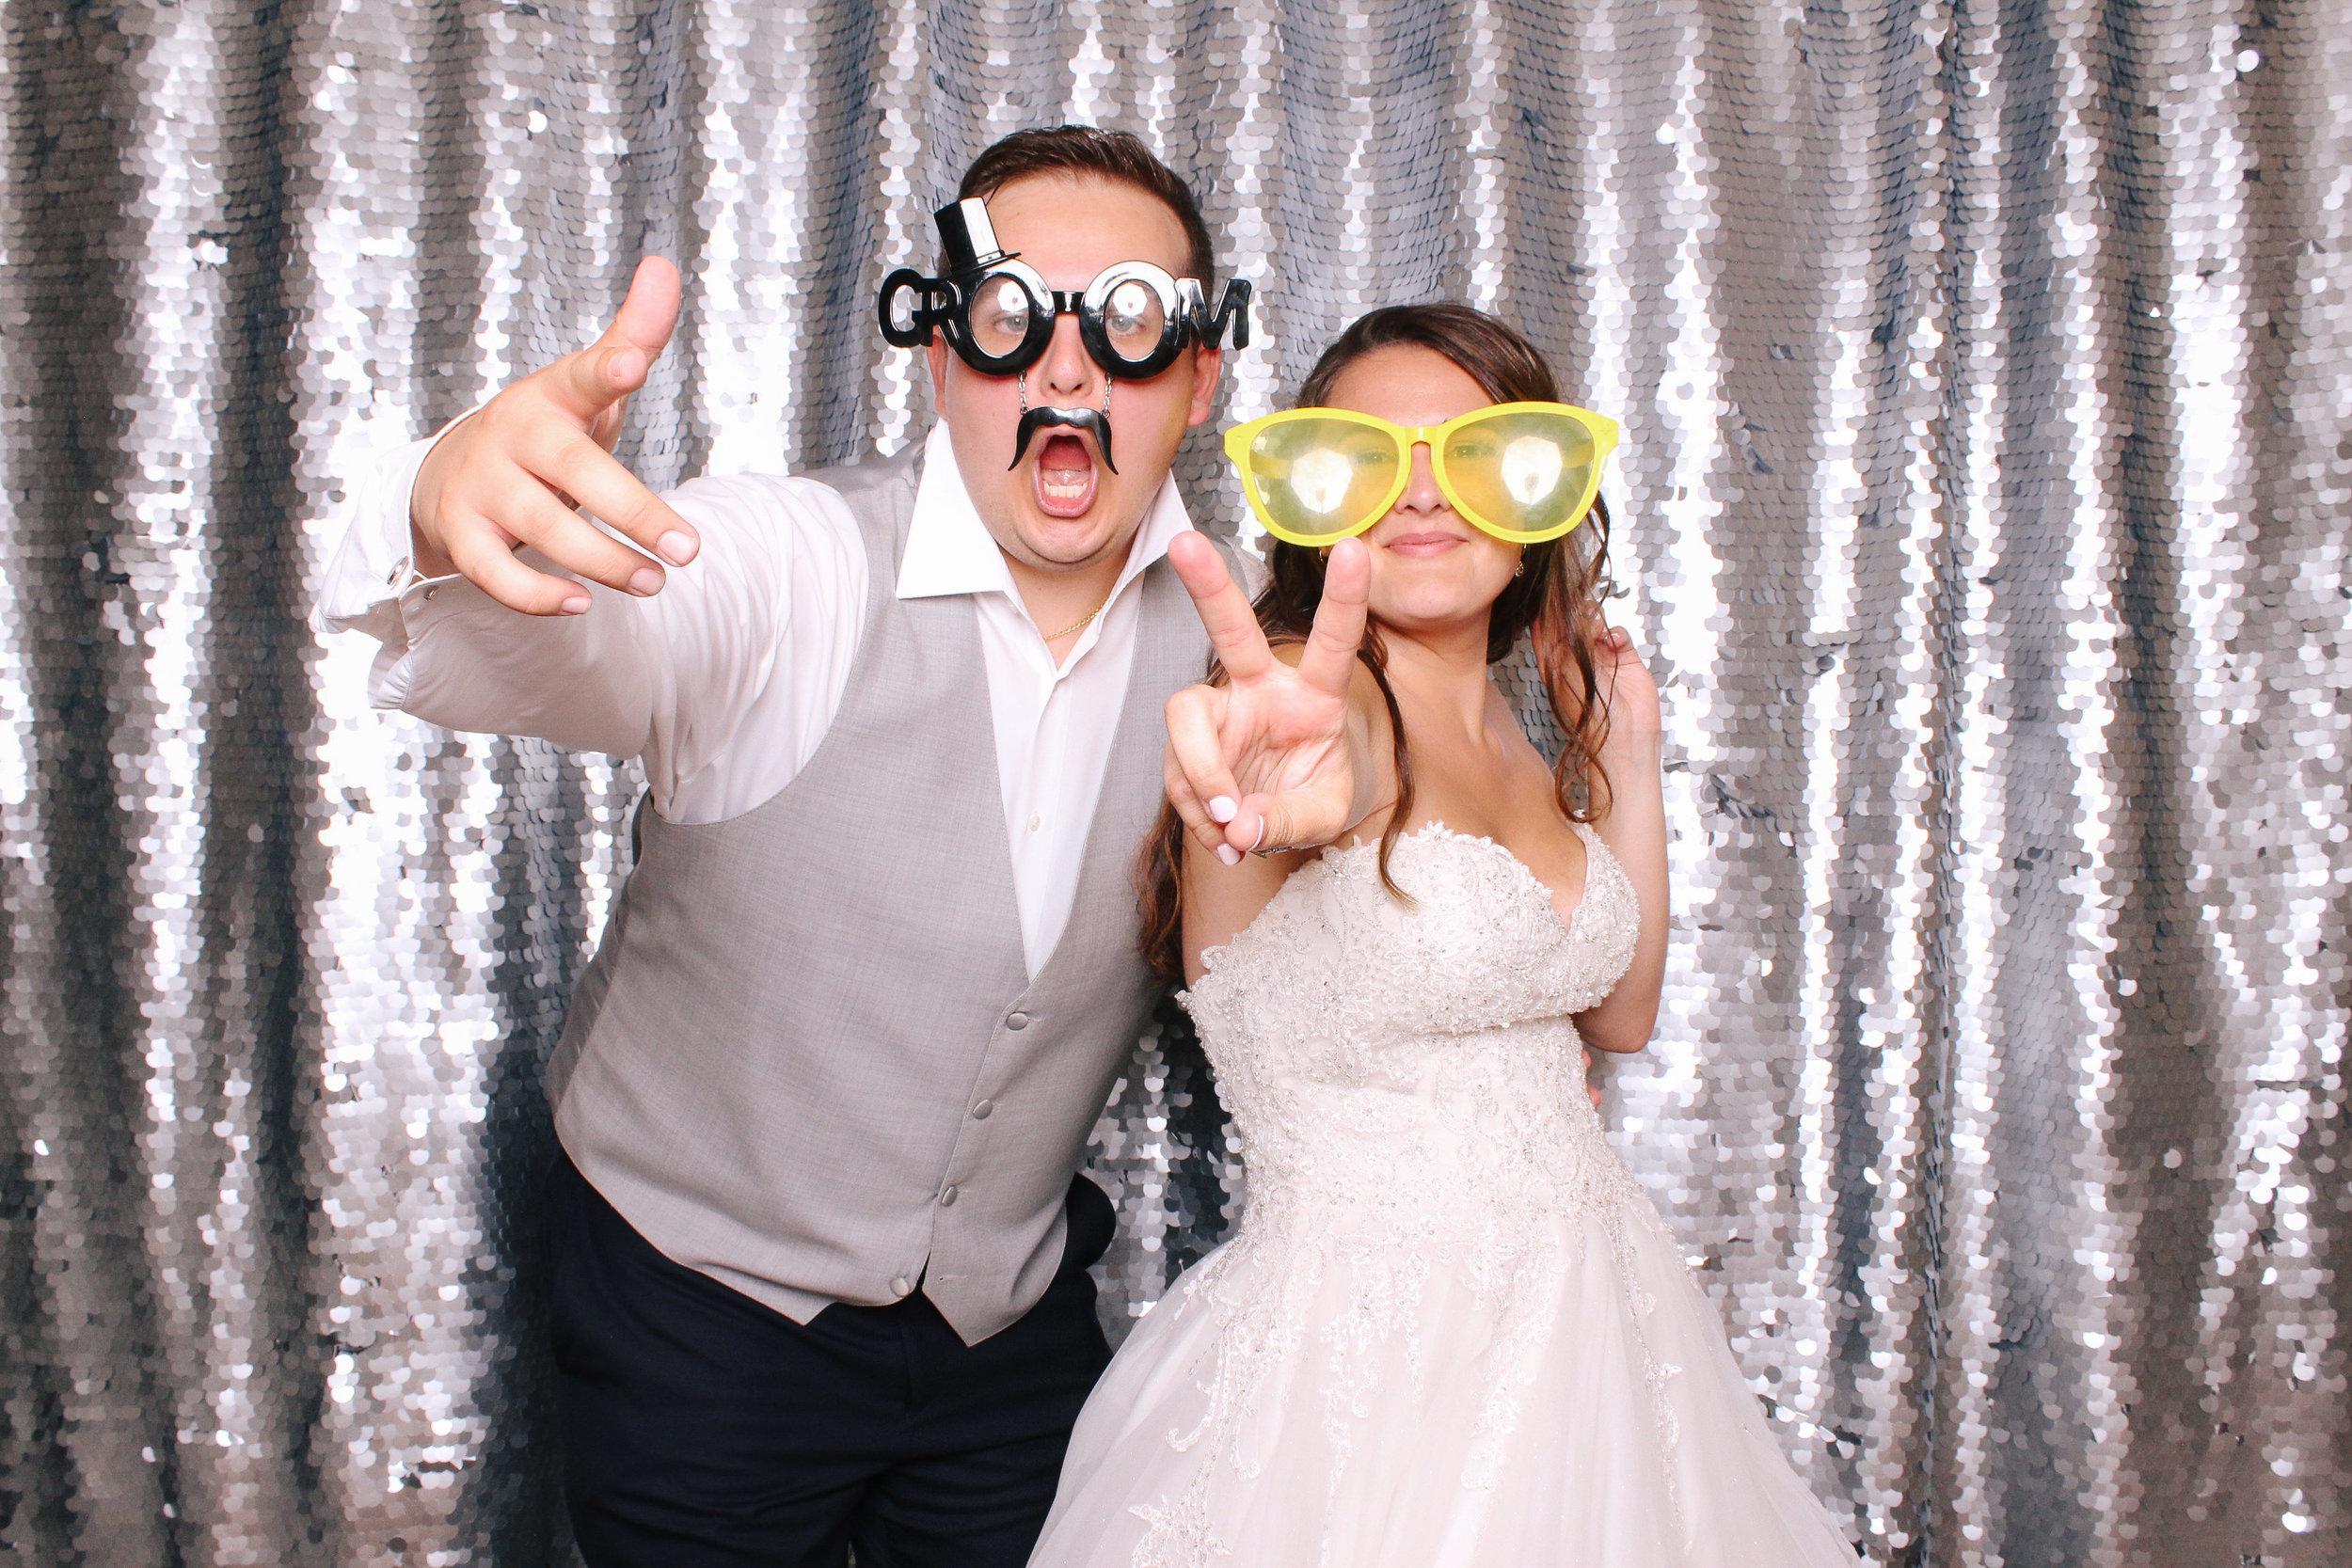 0202 Cleveland Wedding Photobooth too much awesomeness.jpg